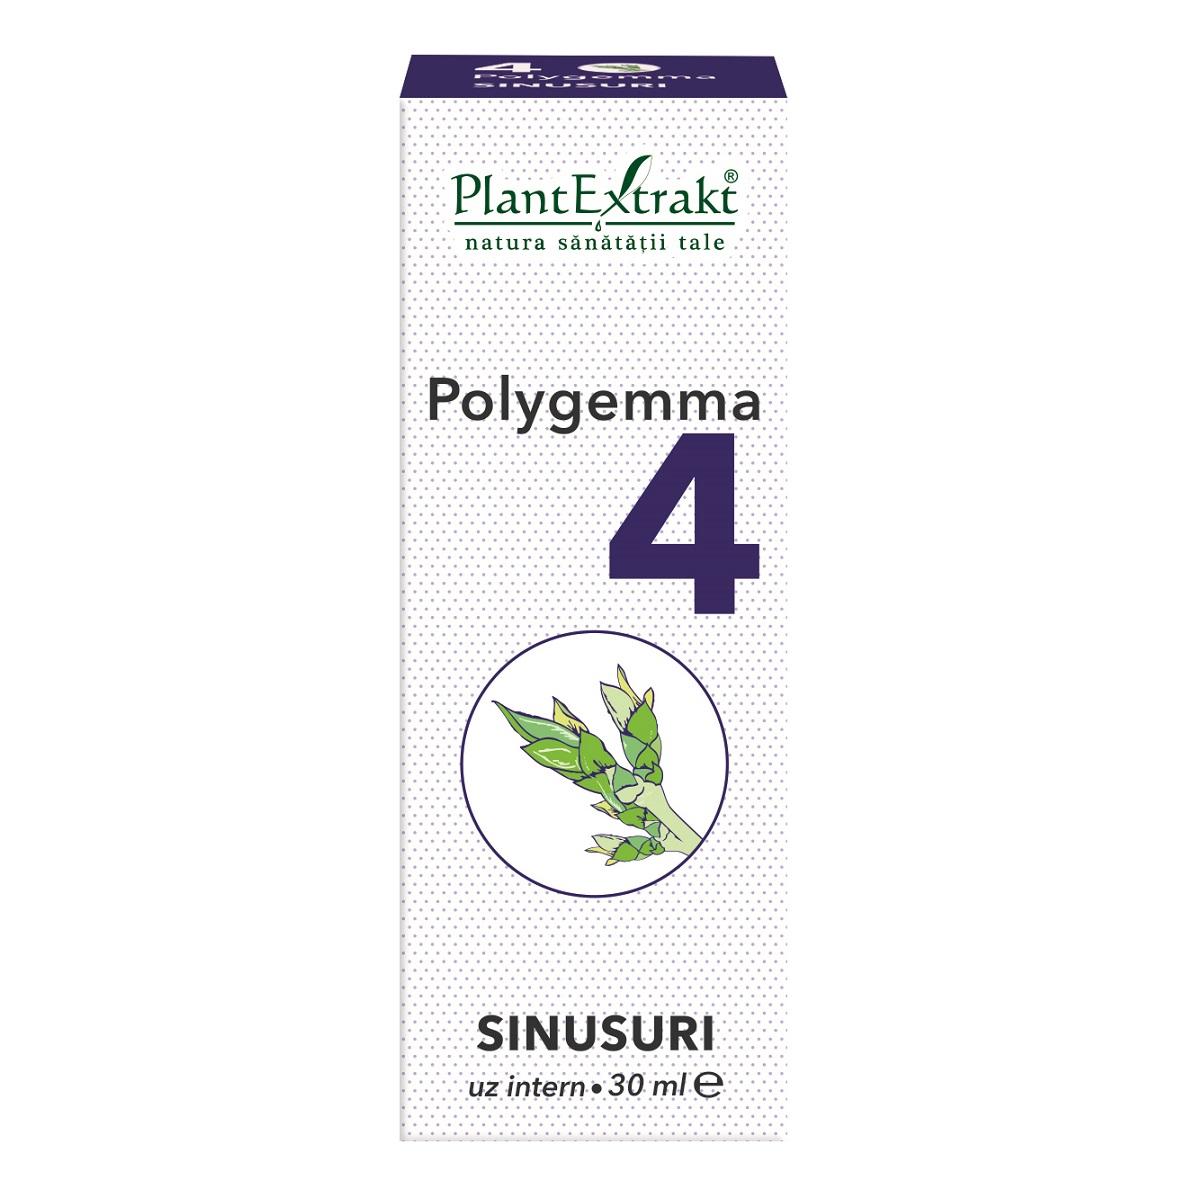 Polygemma 4 sinusuri, 30ml, Plant Extrakt drmax.ro